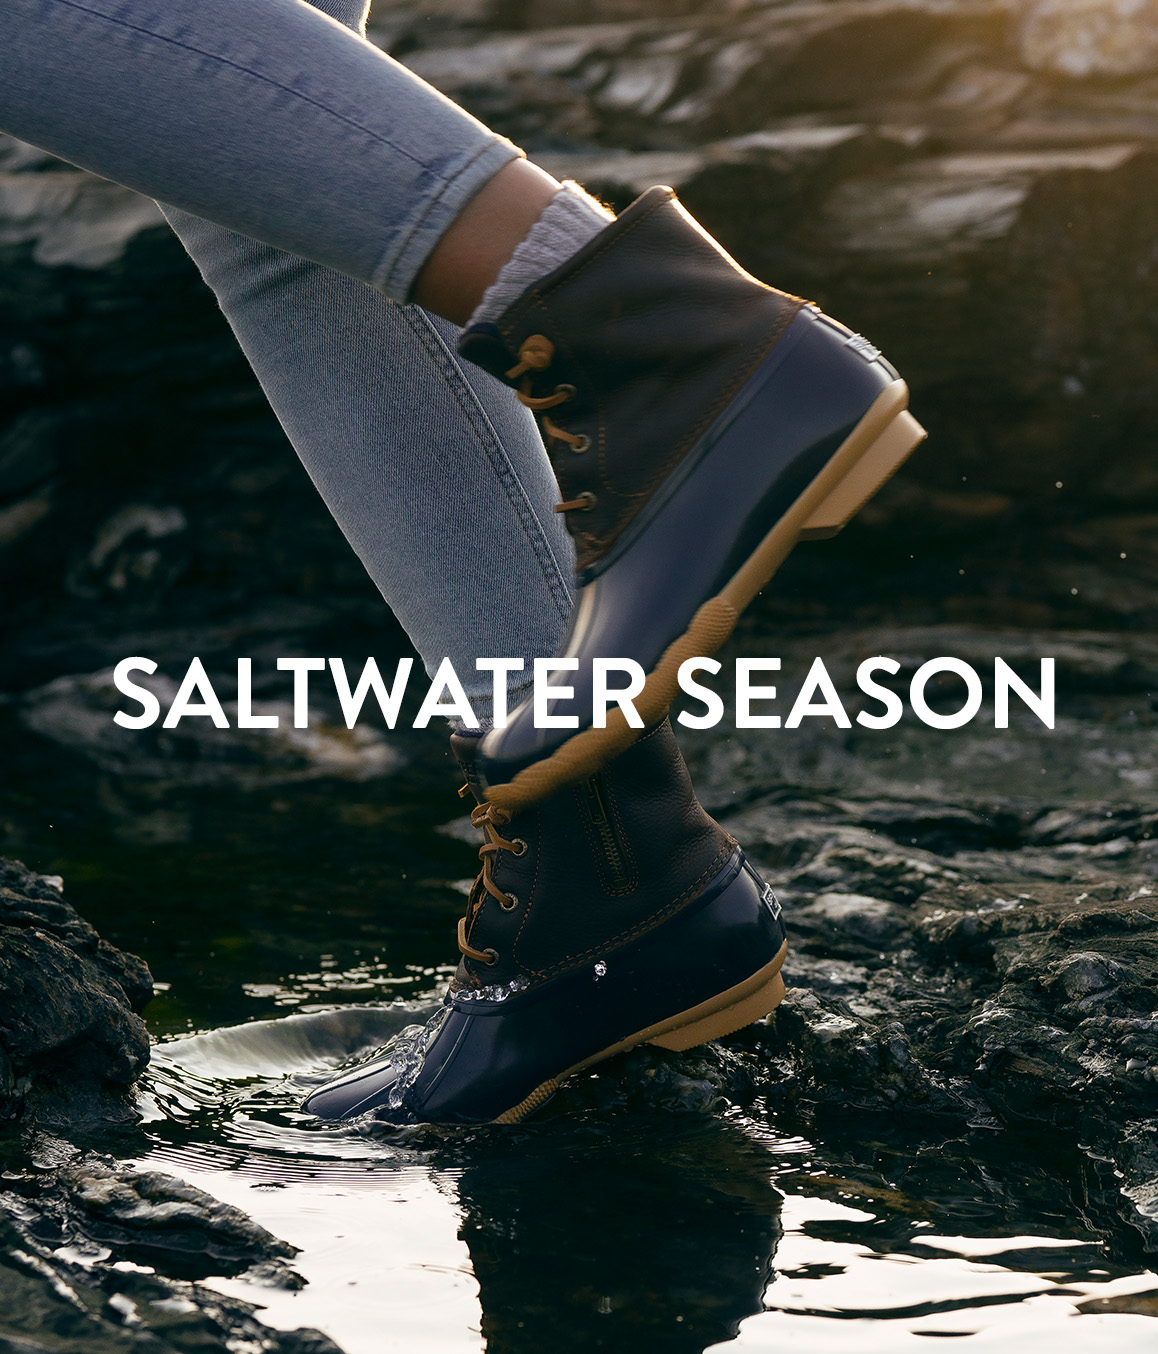 Women wearing Saltwater Boots